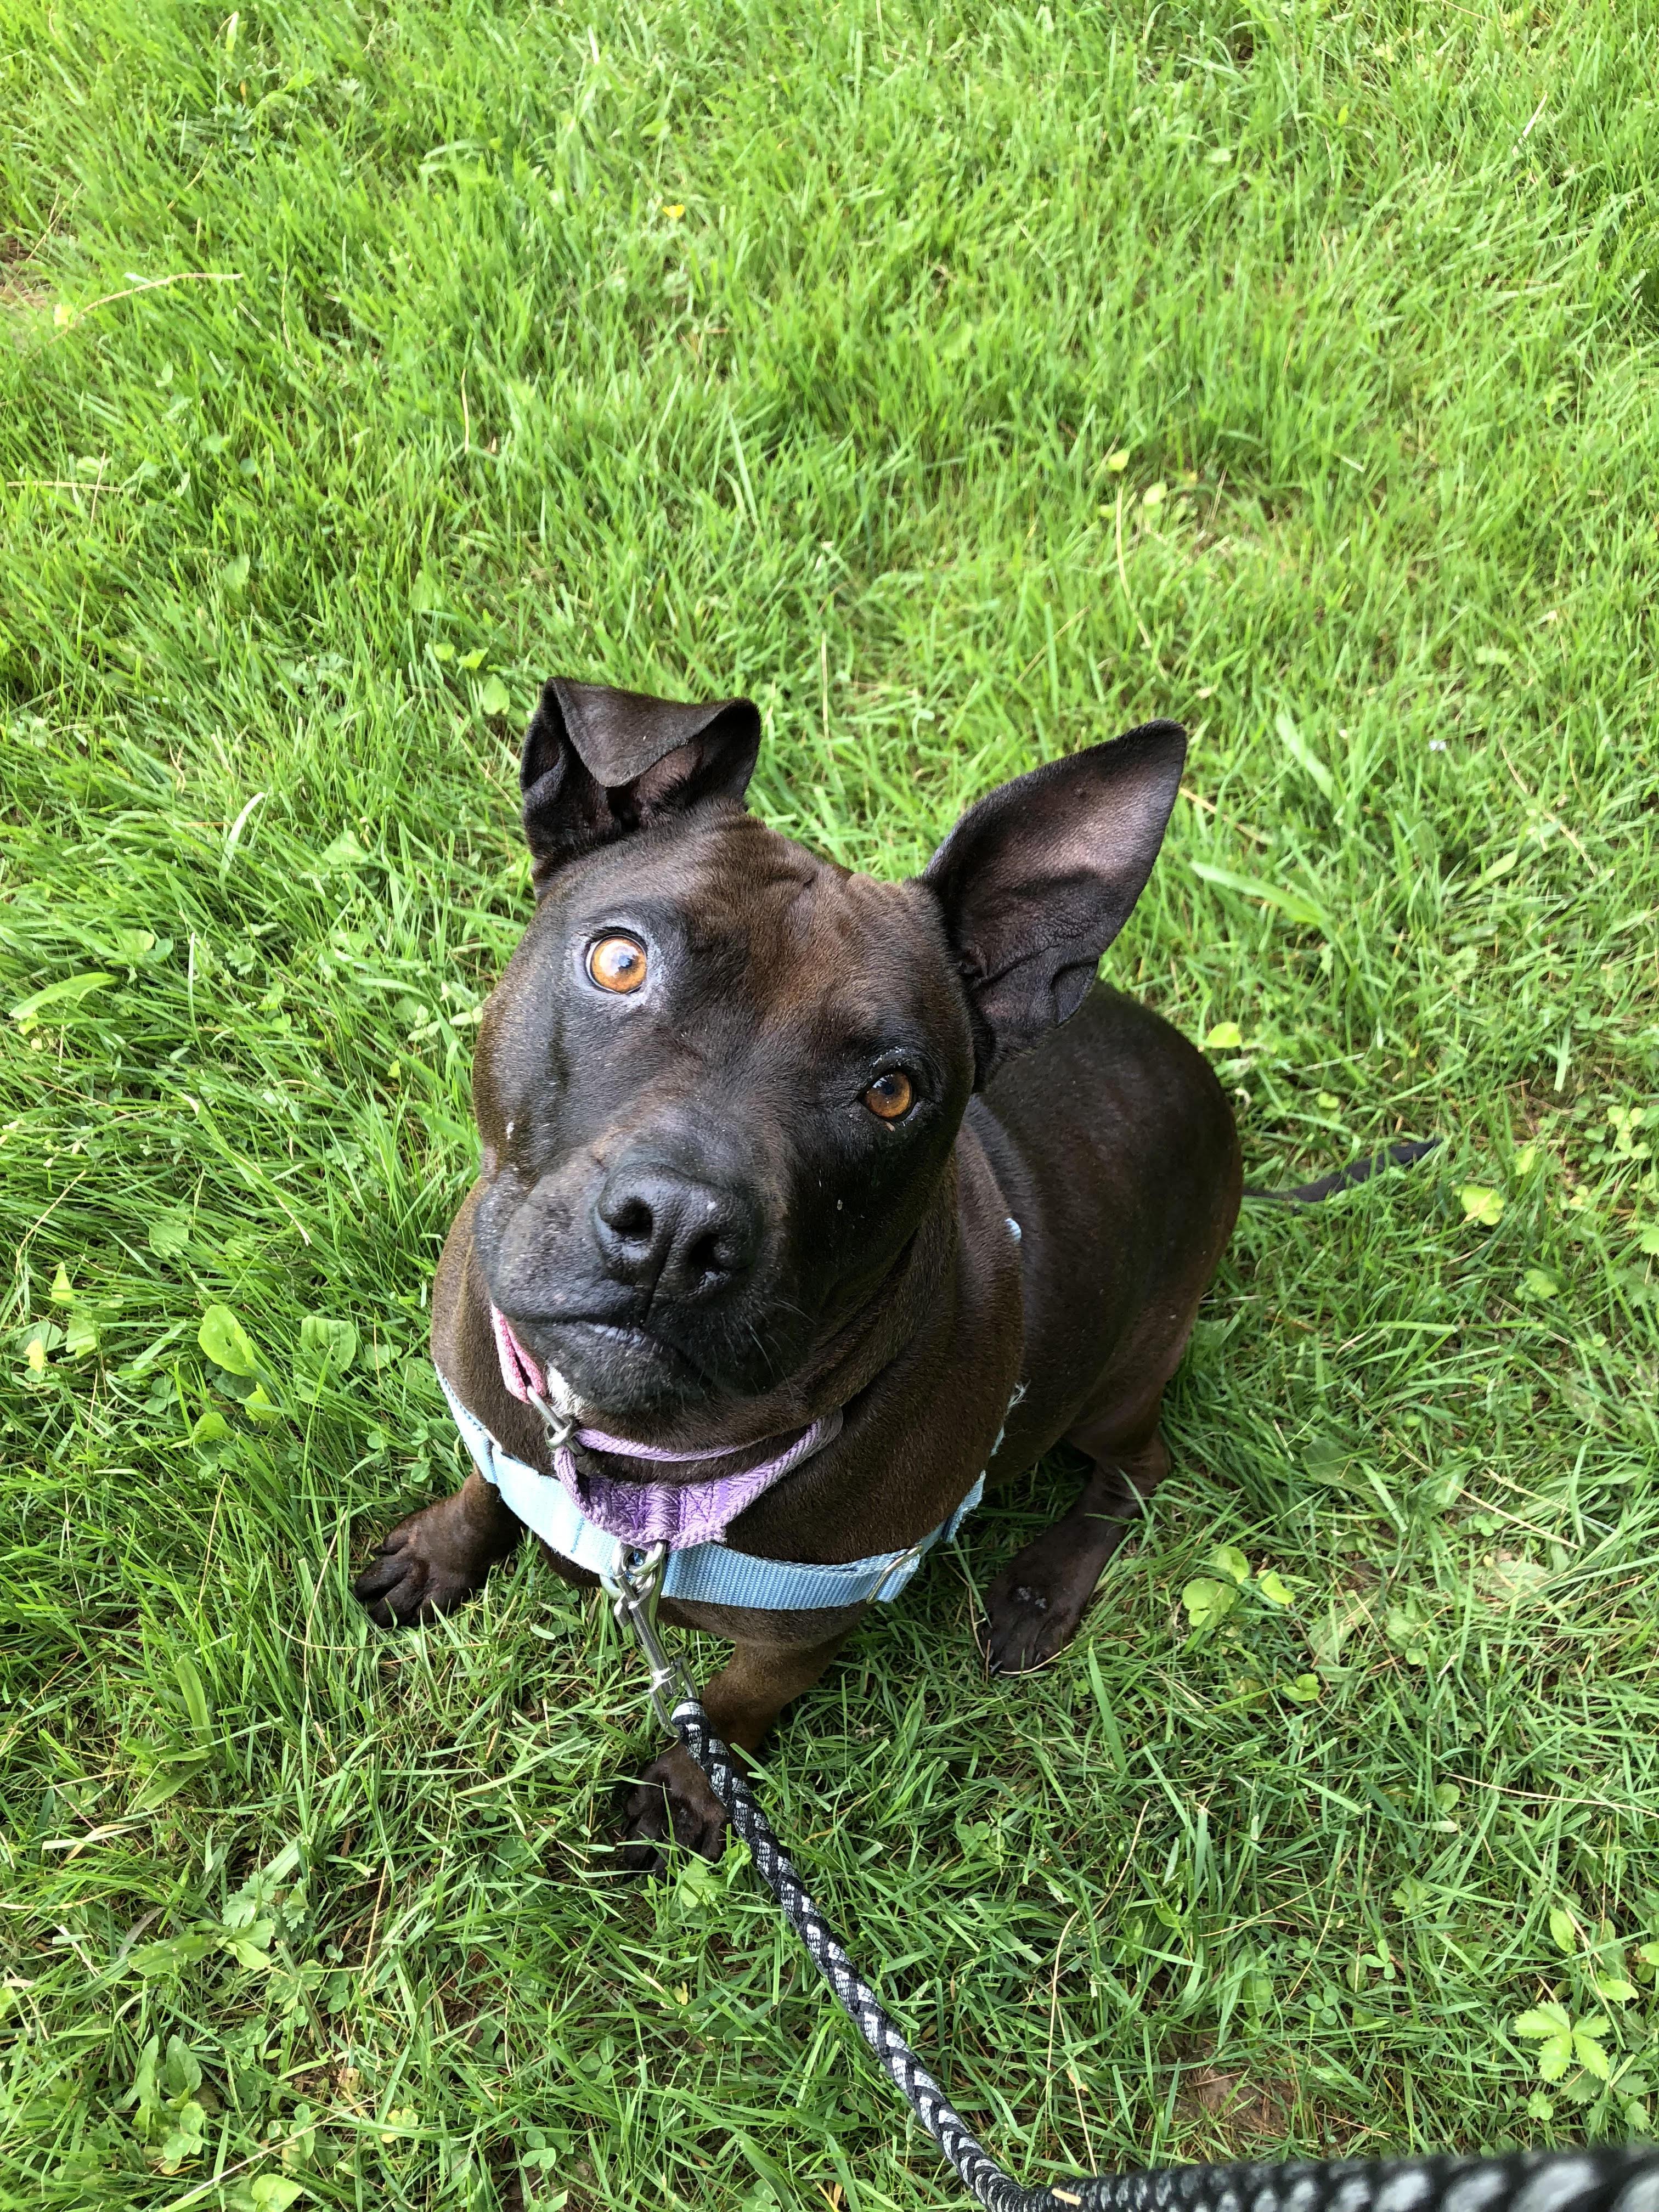 Sophie Pit Bull dog